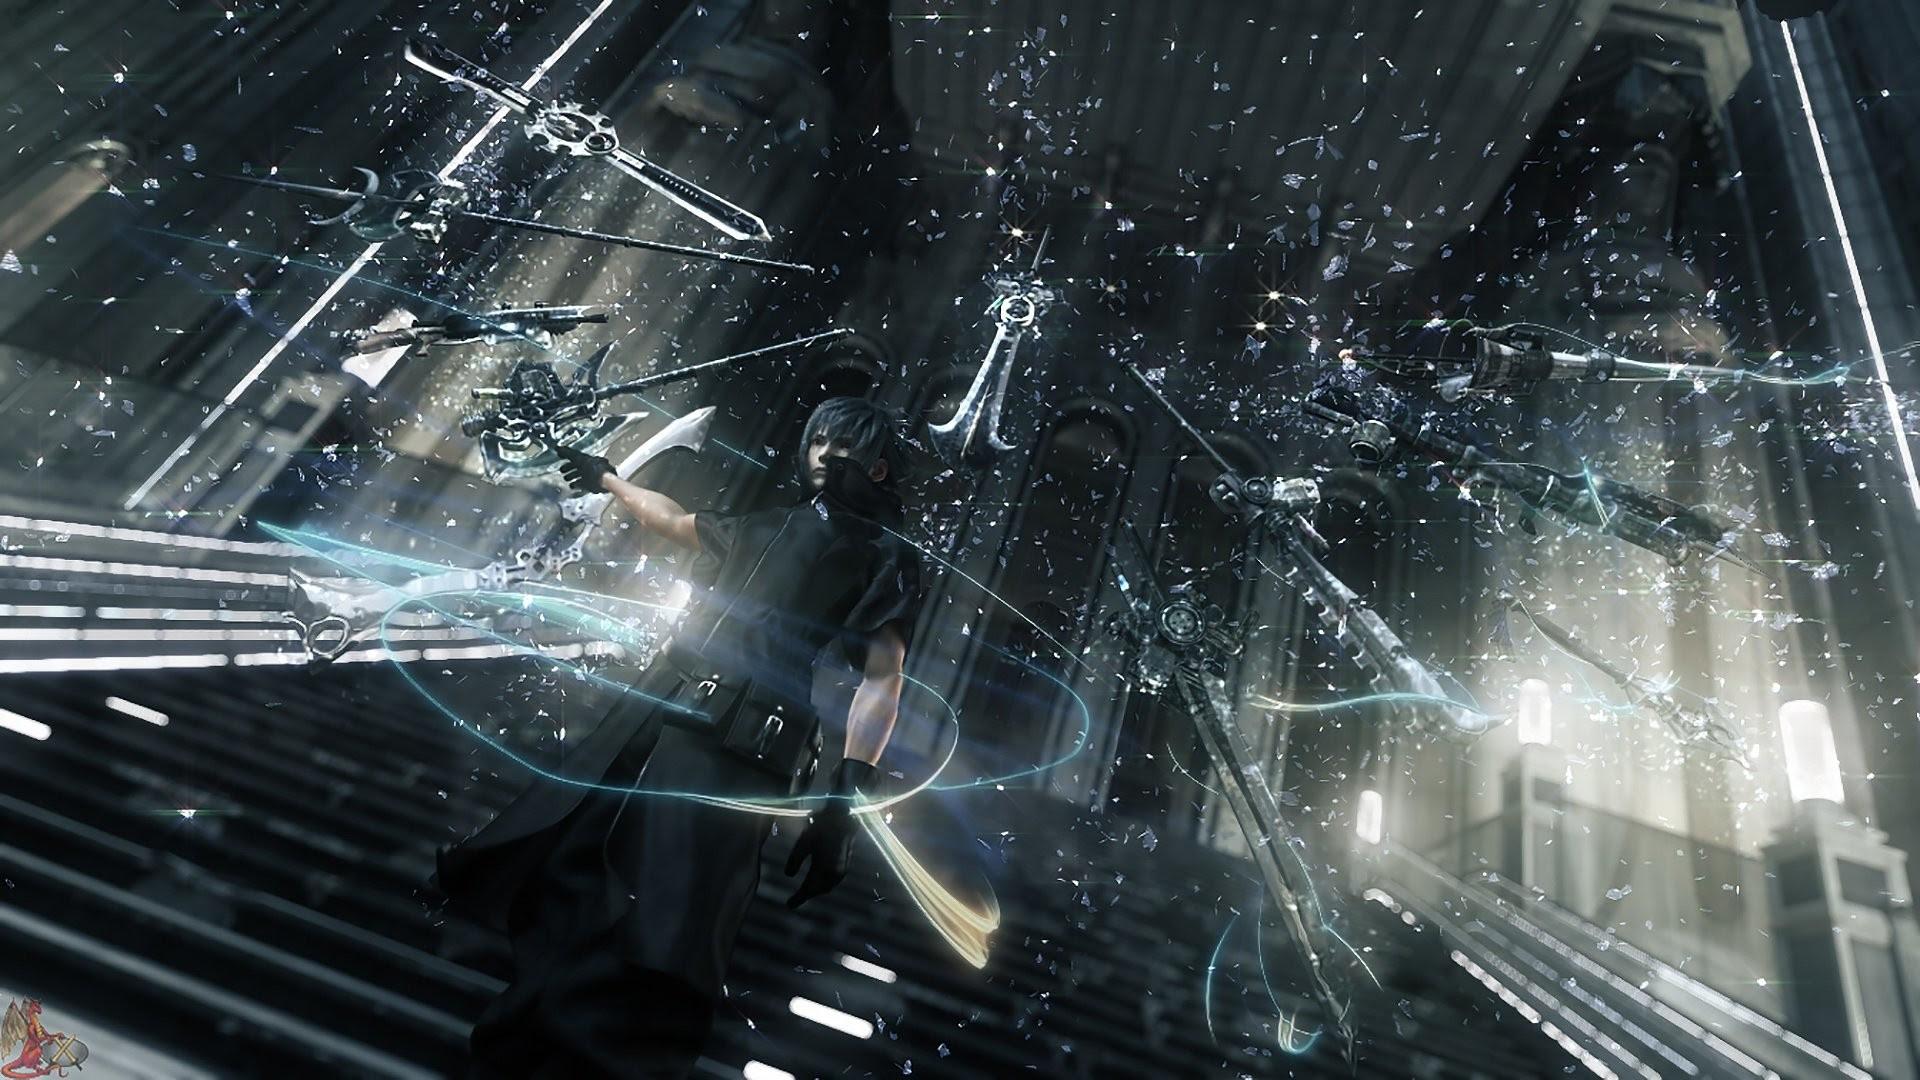 Final Fantasy Xv Hd Wallpaper 81 Images